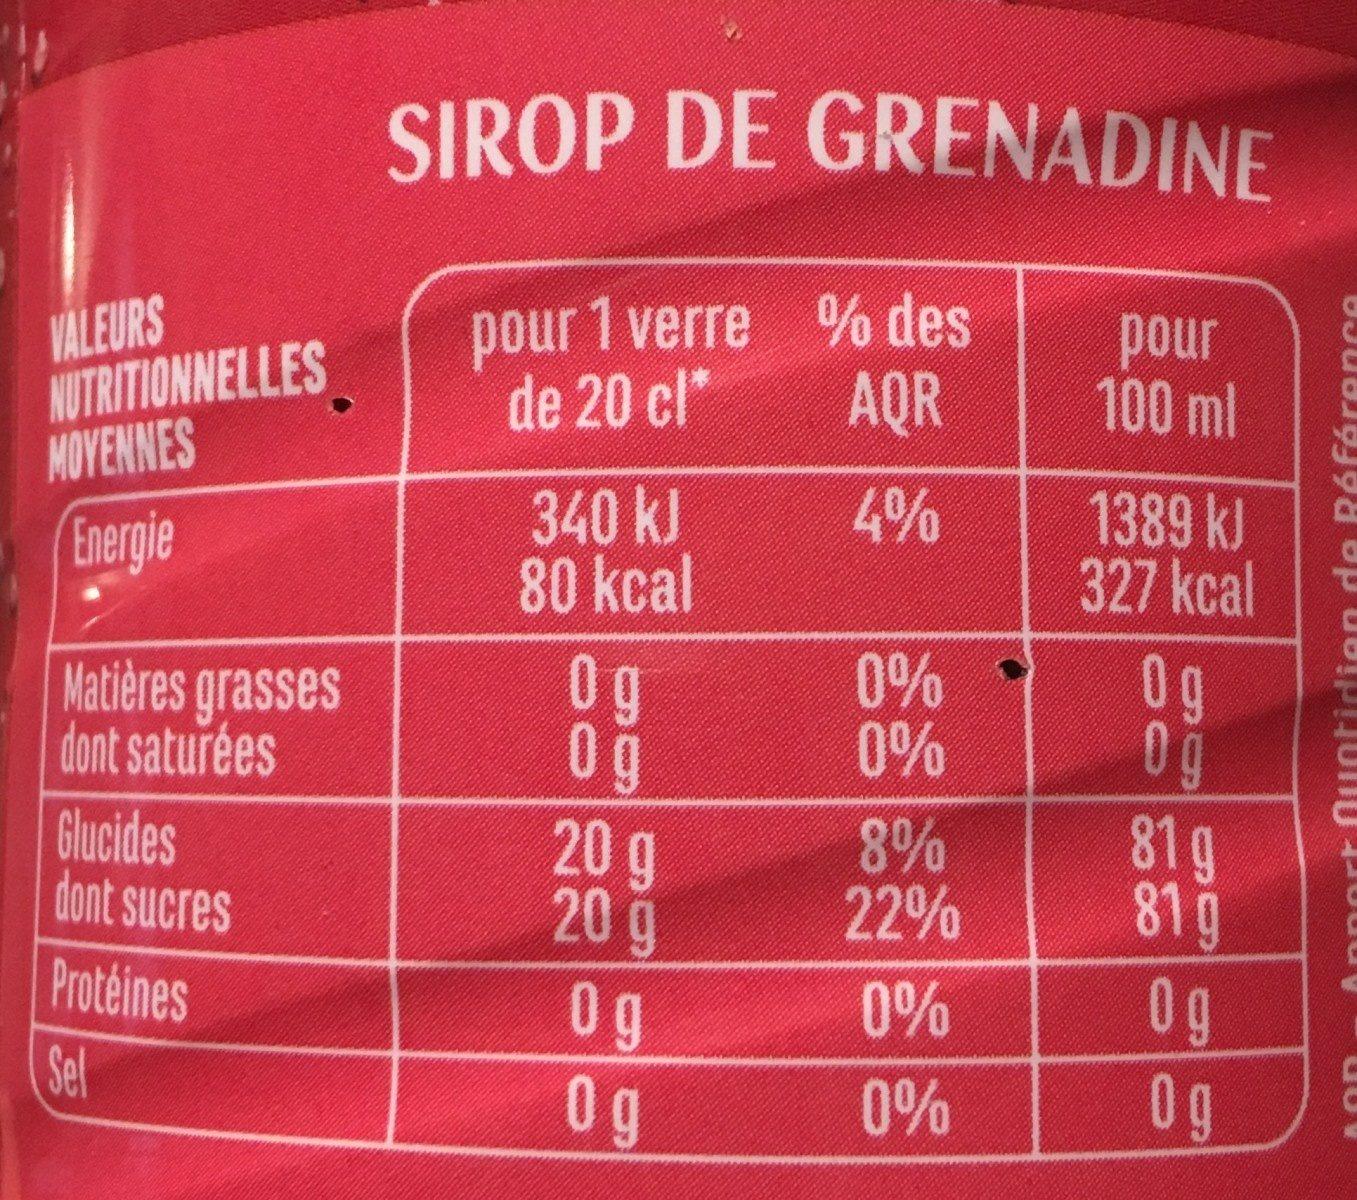 Sirop de Grenadine - Informations nutritionnelles - fr